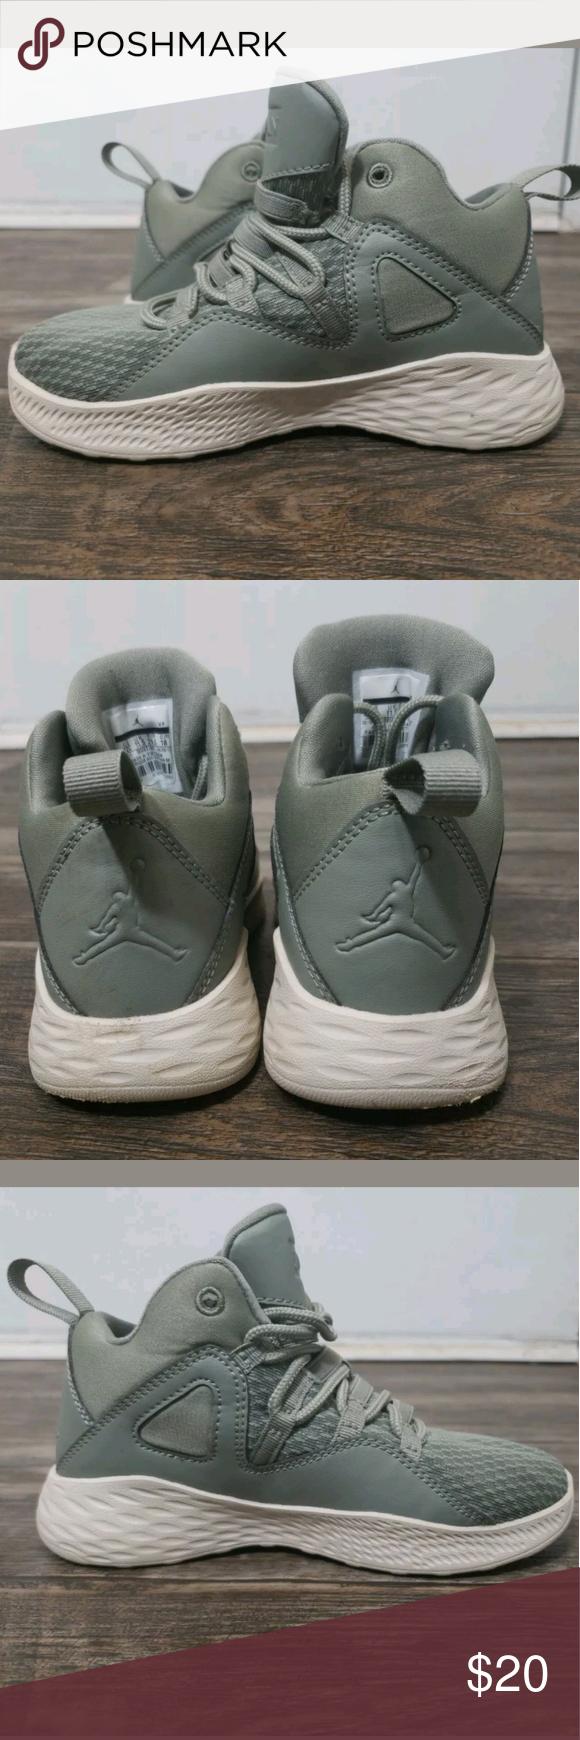 buy cheap d2ec8 6655d Nike Air Jordan Olive Kids Sneaker Nike Air Jordan Sneaker ...